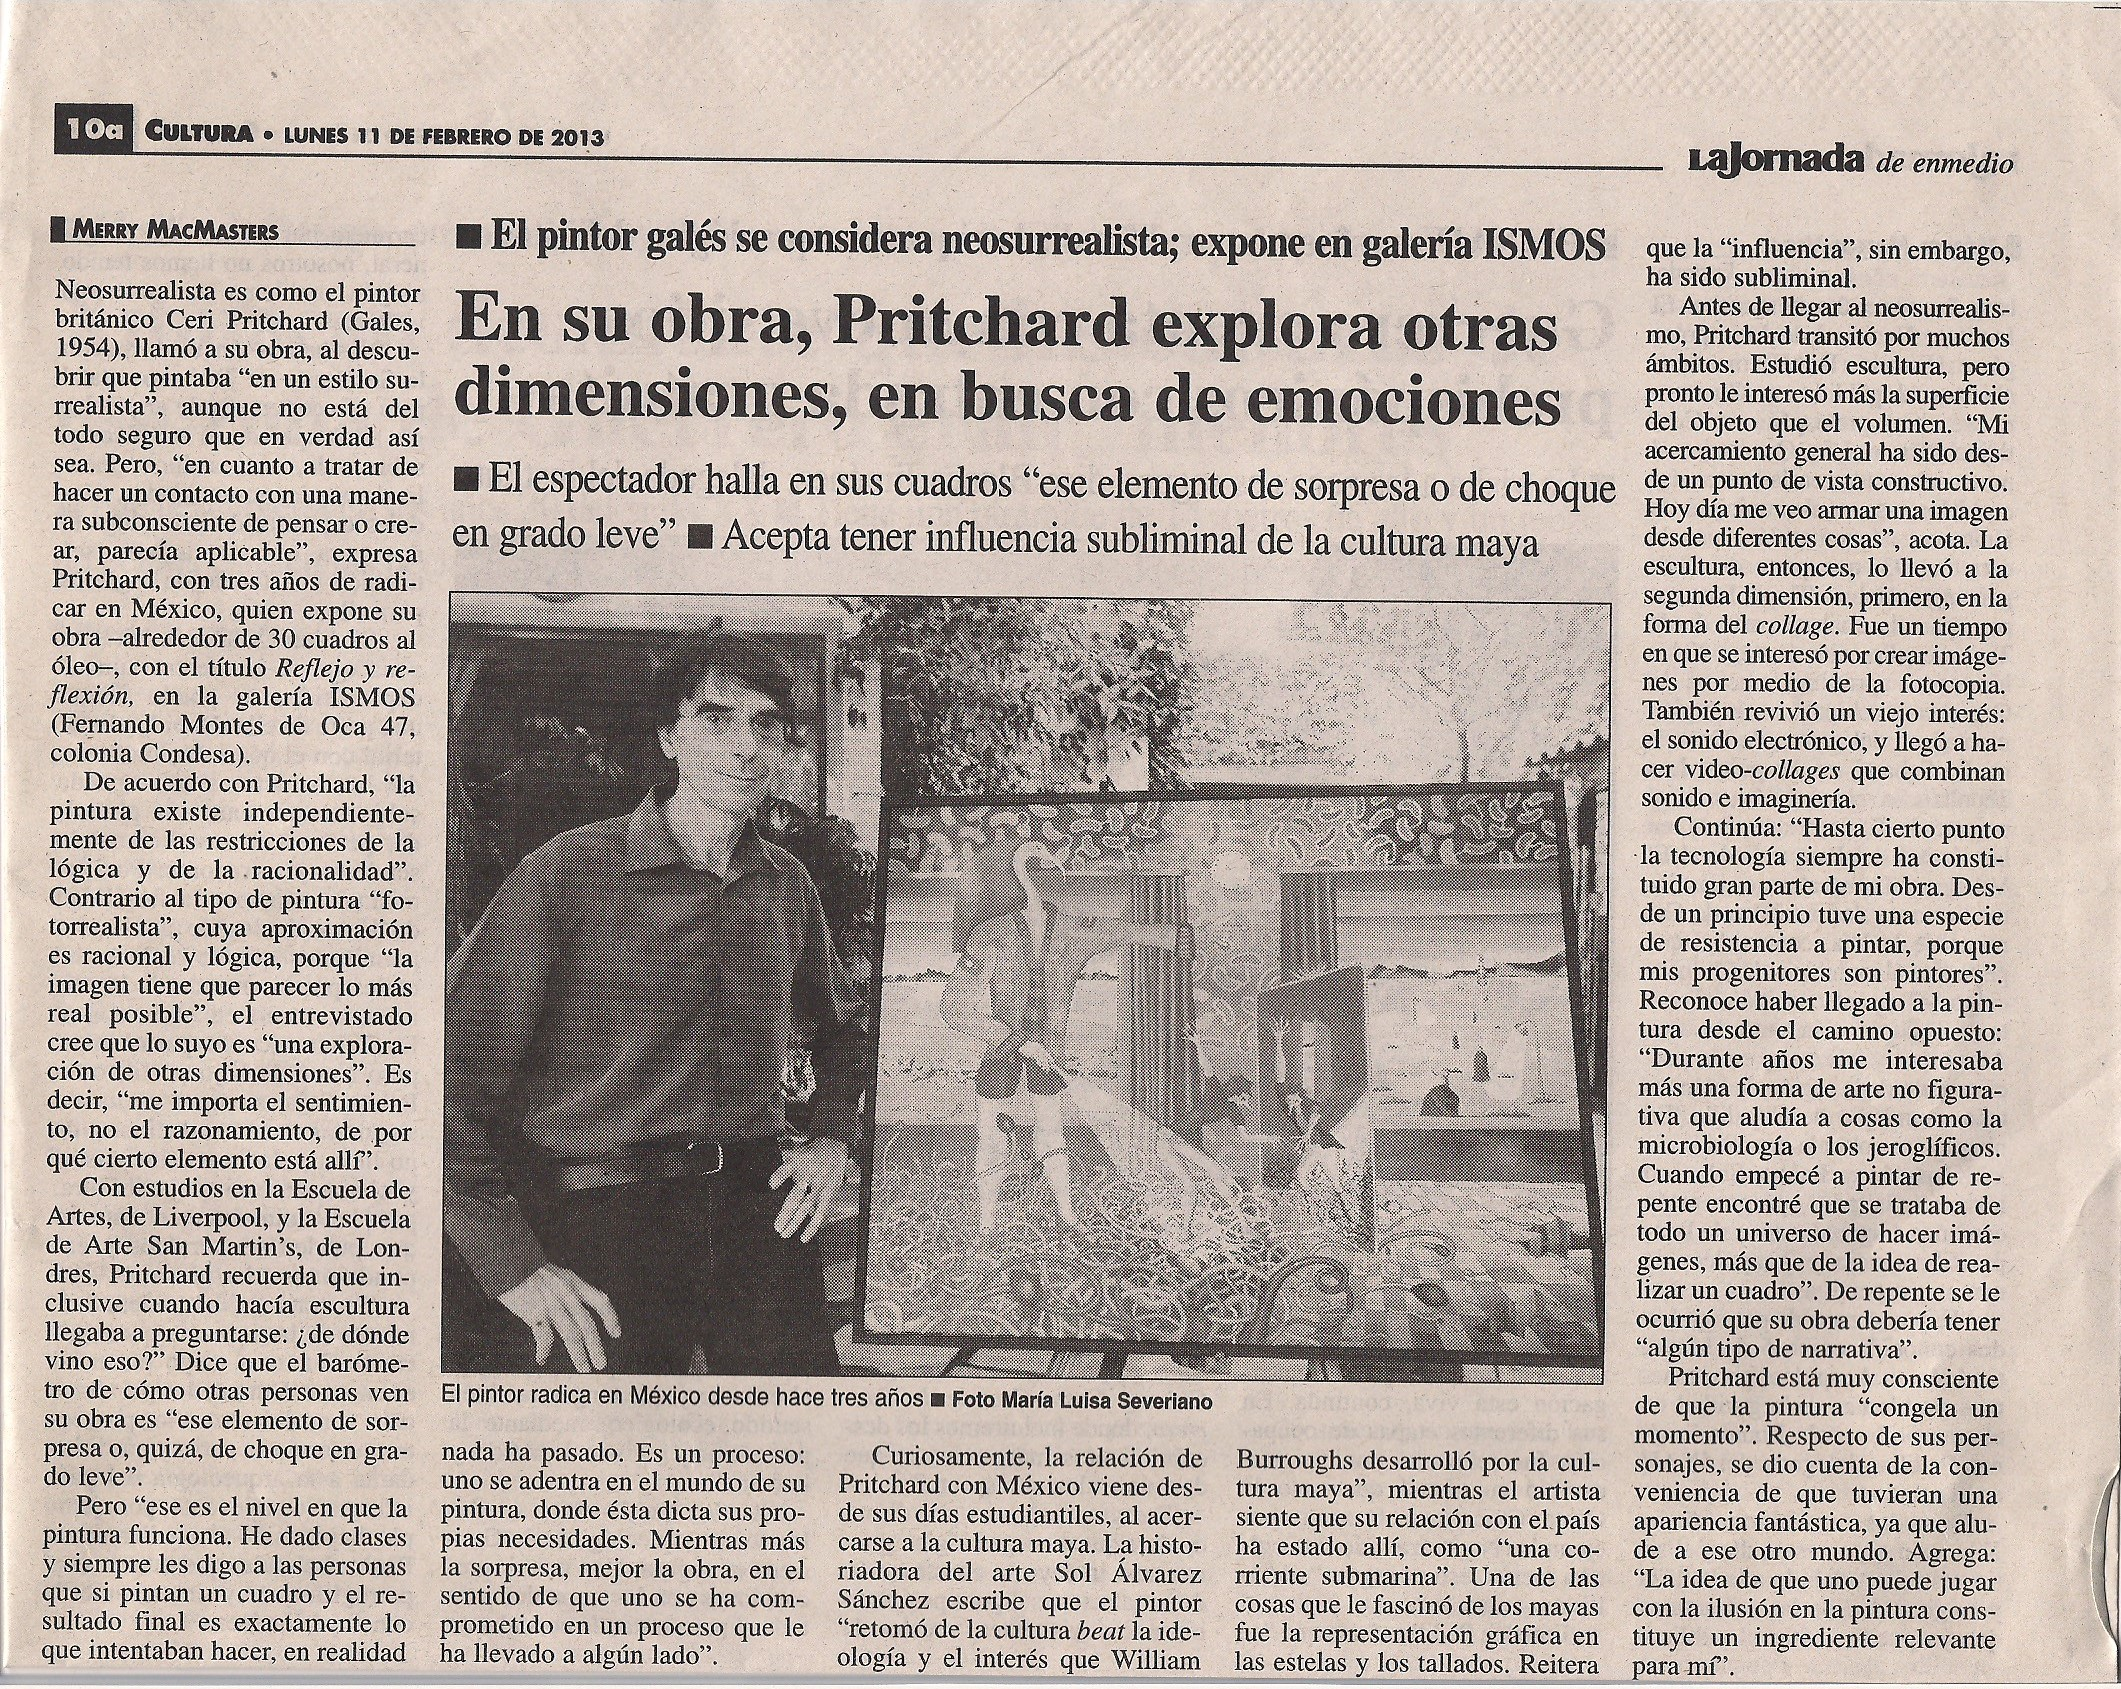 12 Ceri Pritchard en ISMOS 2013 LA JORNADA